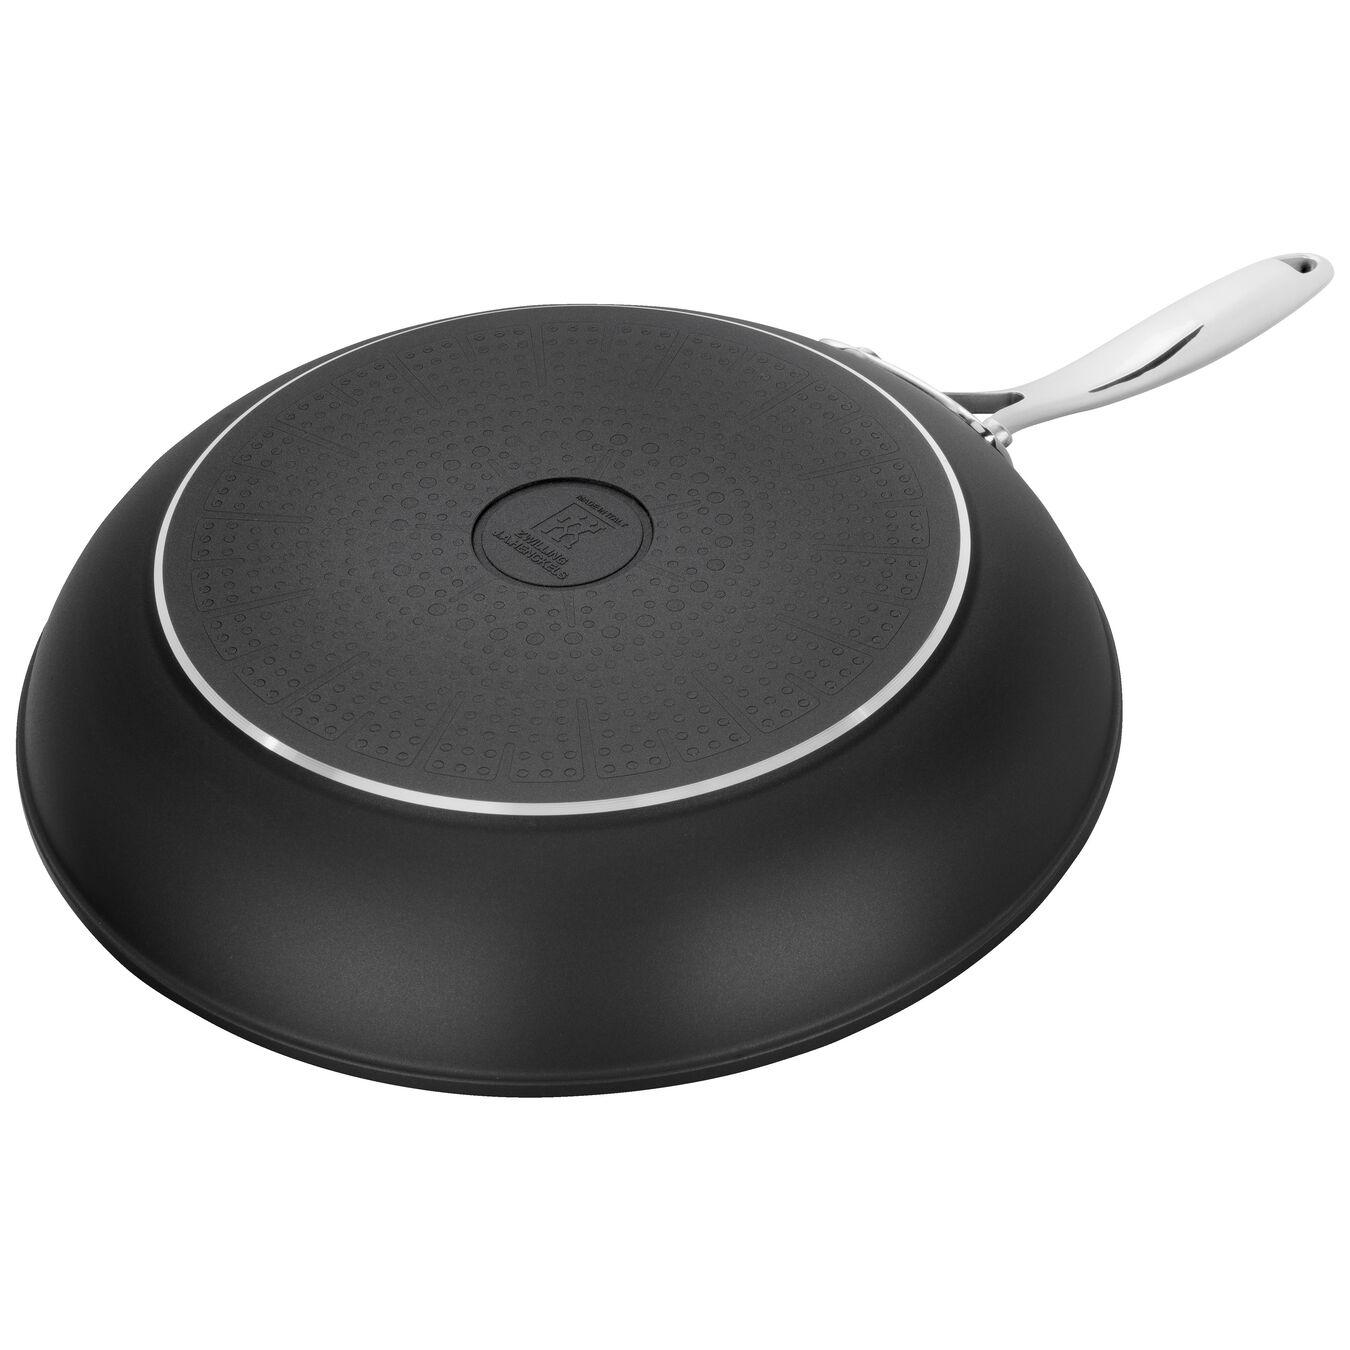 30 cm / 12 inch Aluminum Frying pan,,large 3